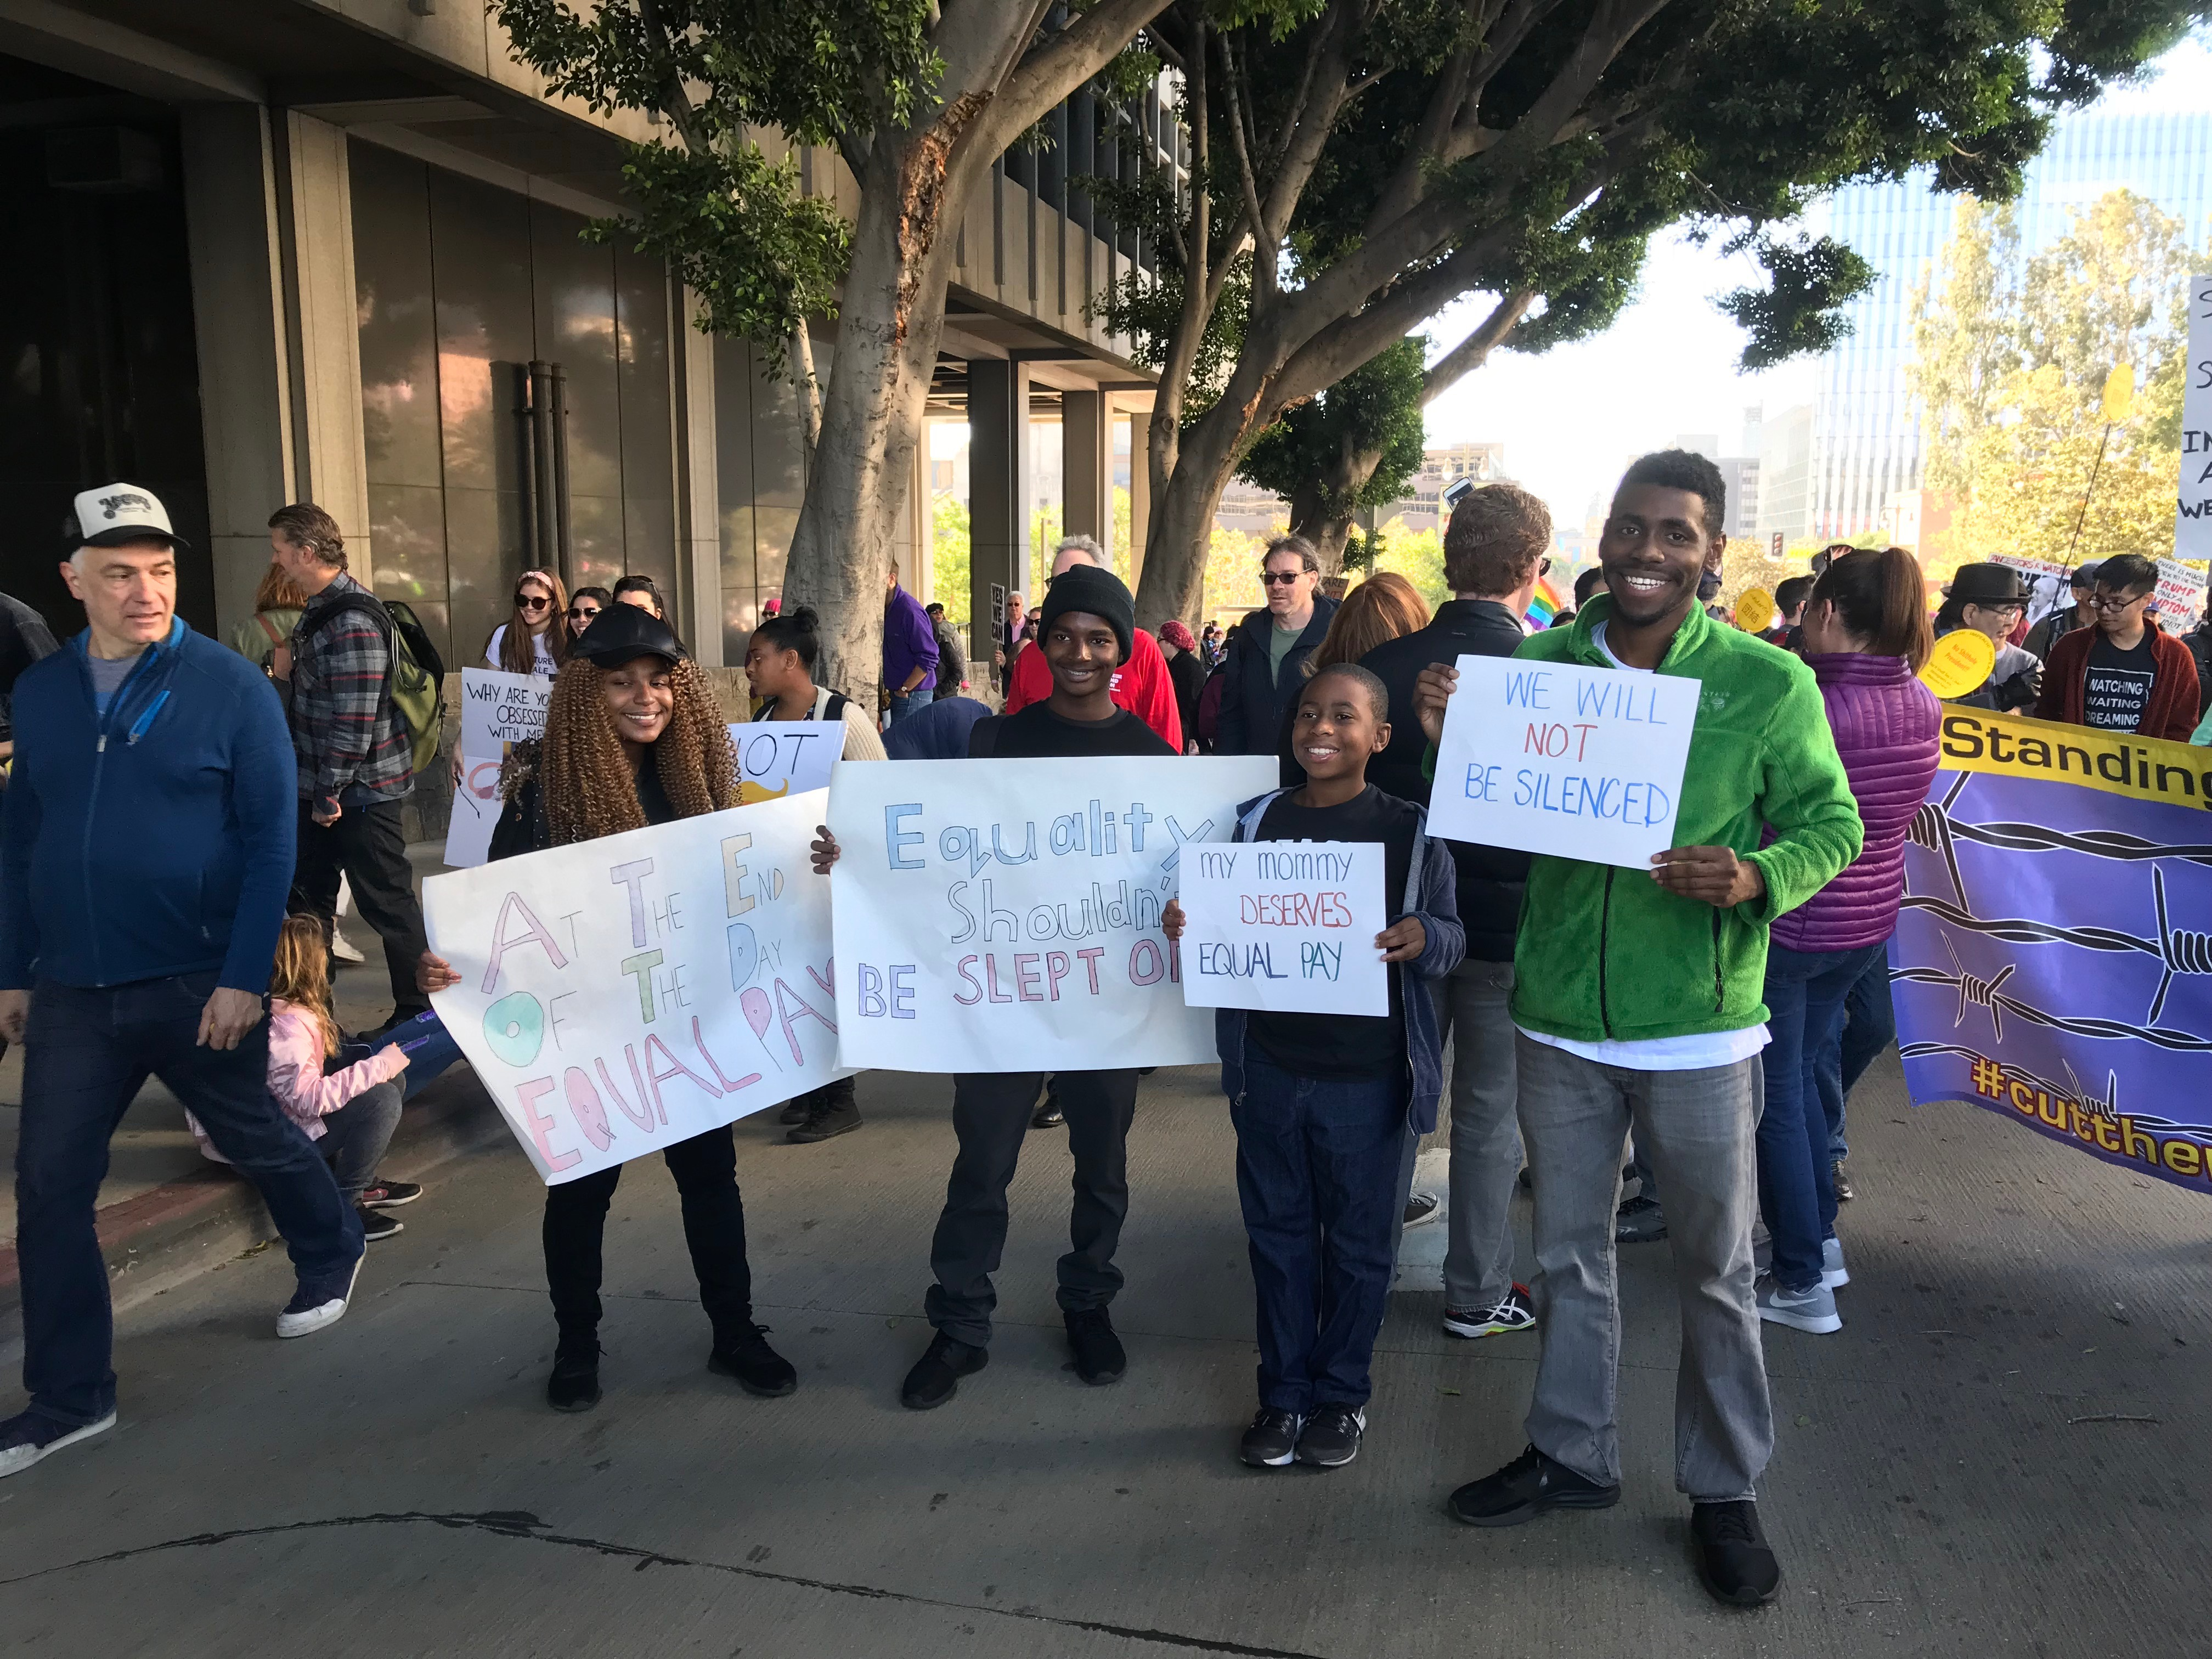 Women's March Los Angeles, 1.20.18